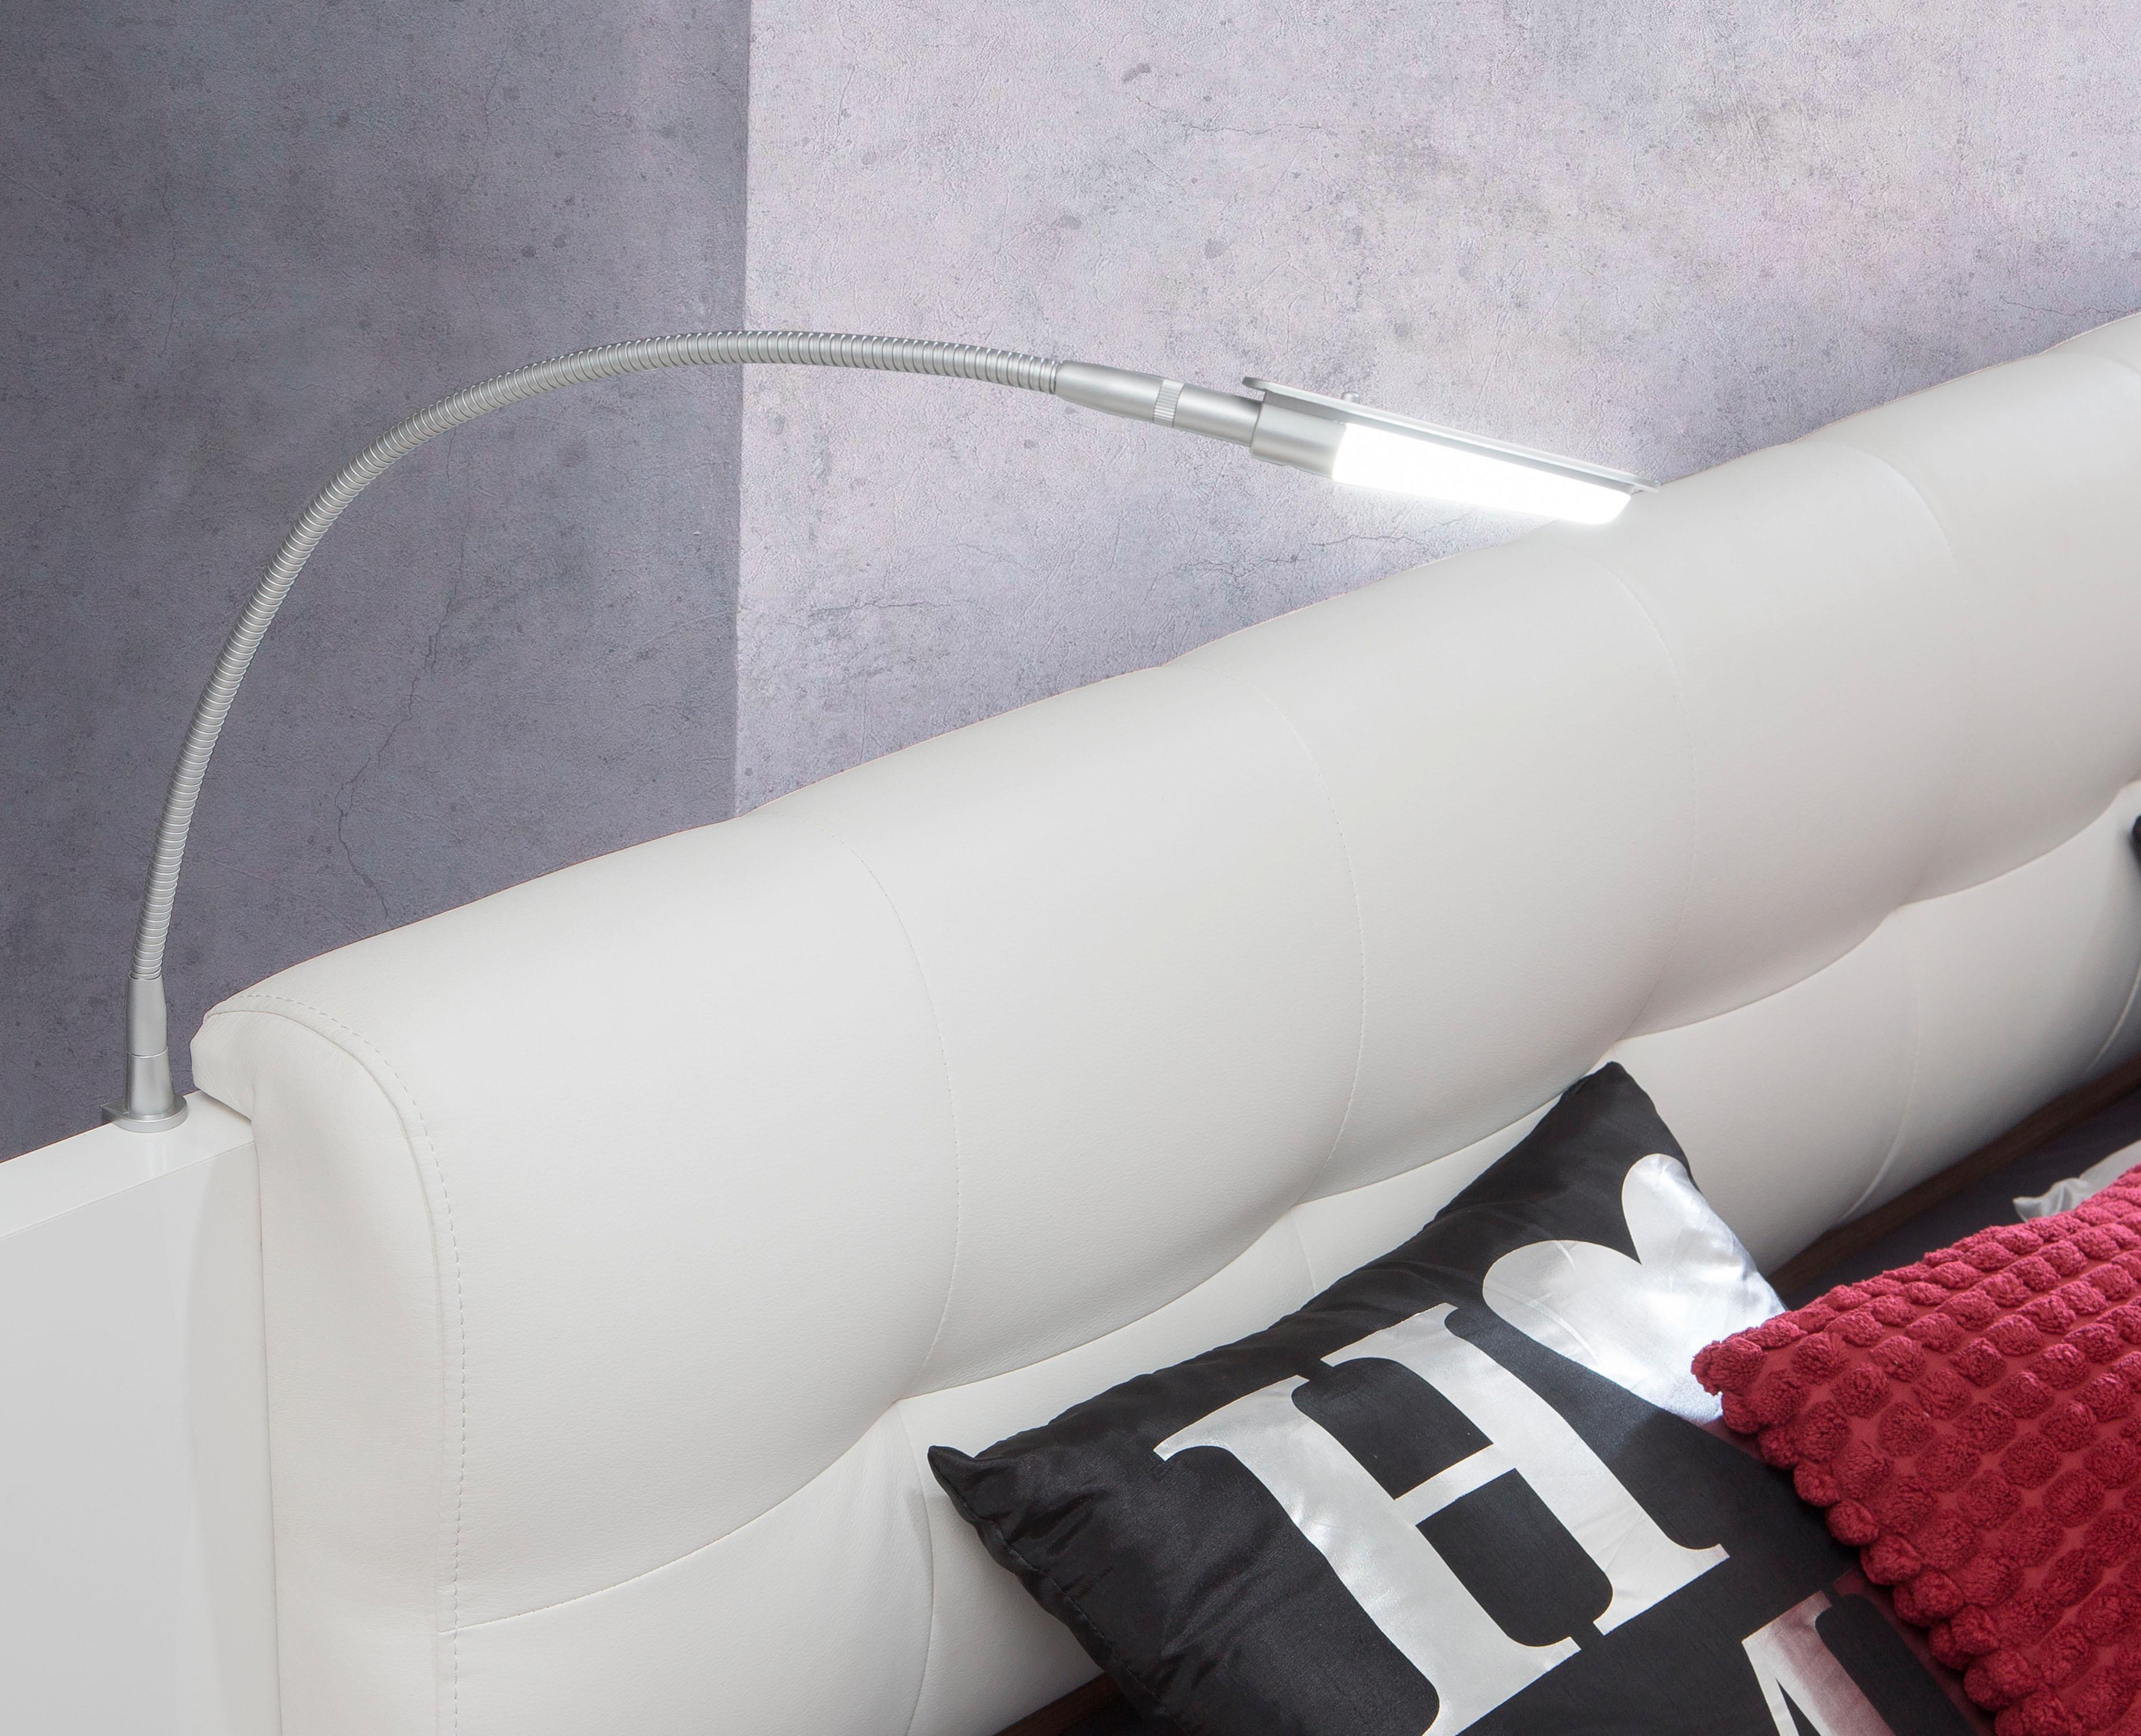 FORTE LED Leselampe, 2er Set weiß Leselampen Lampen Leuchten Leselampe